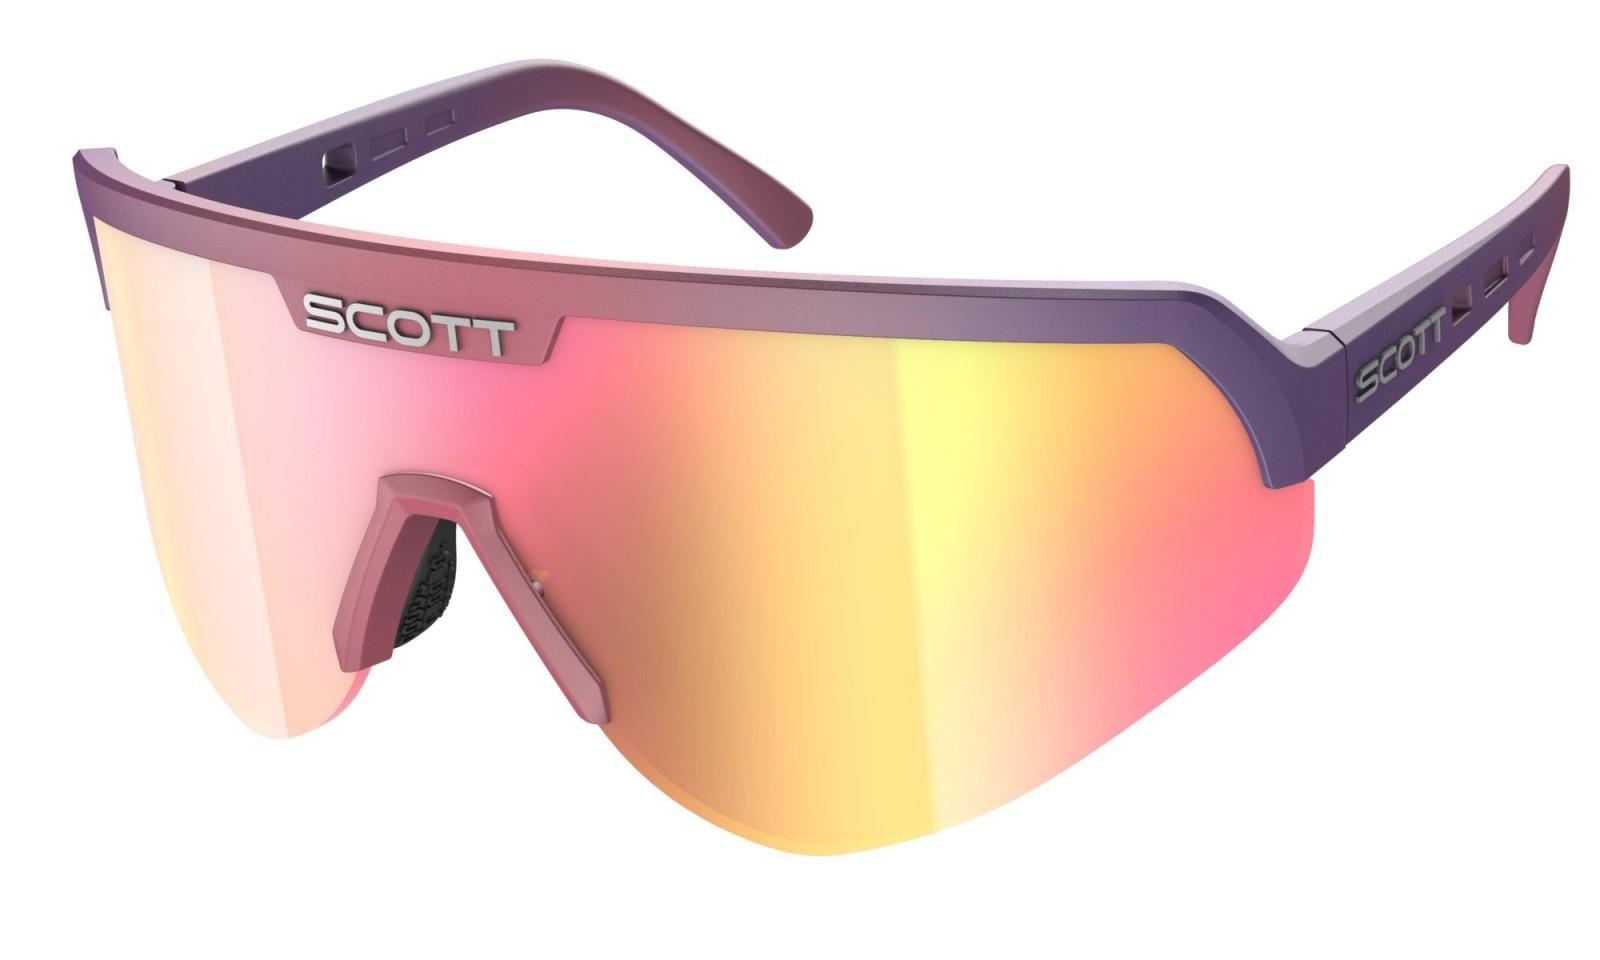 seleccion-regalos-scott-2020/